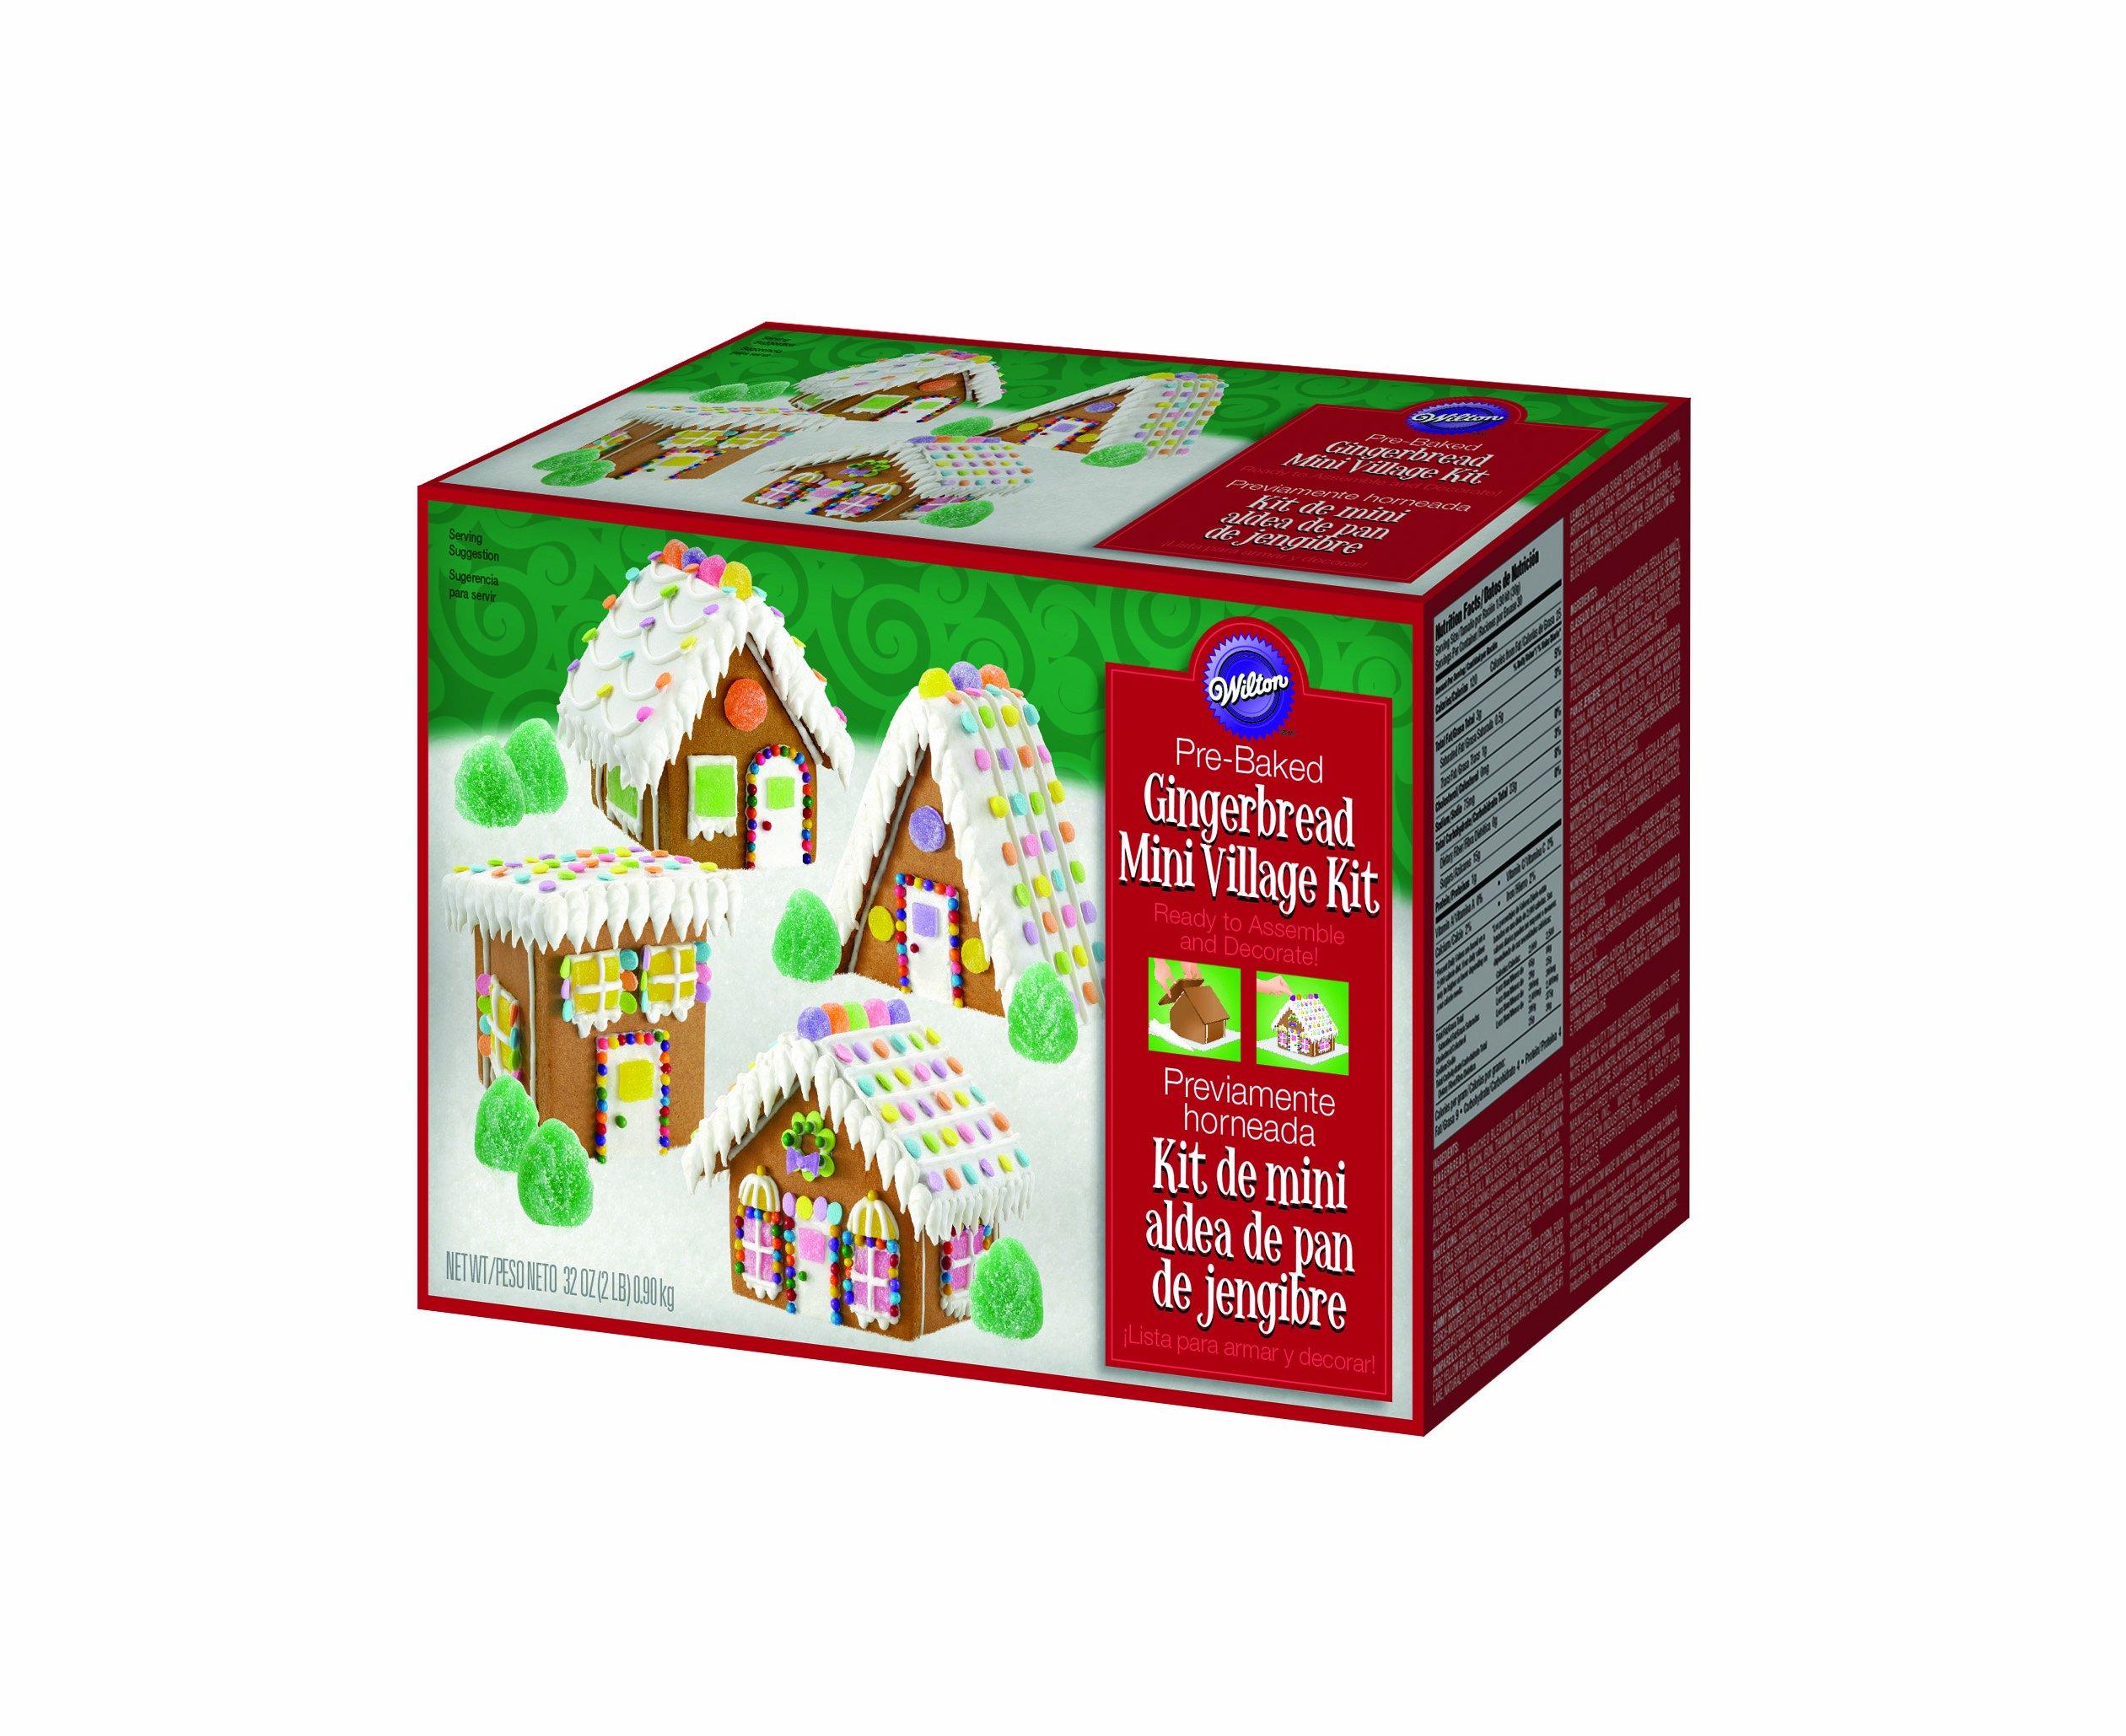 Wilton 2104-1910 Mini Village Gingerbread